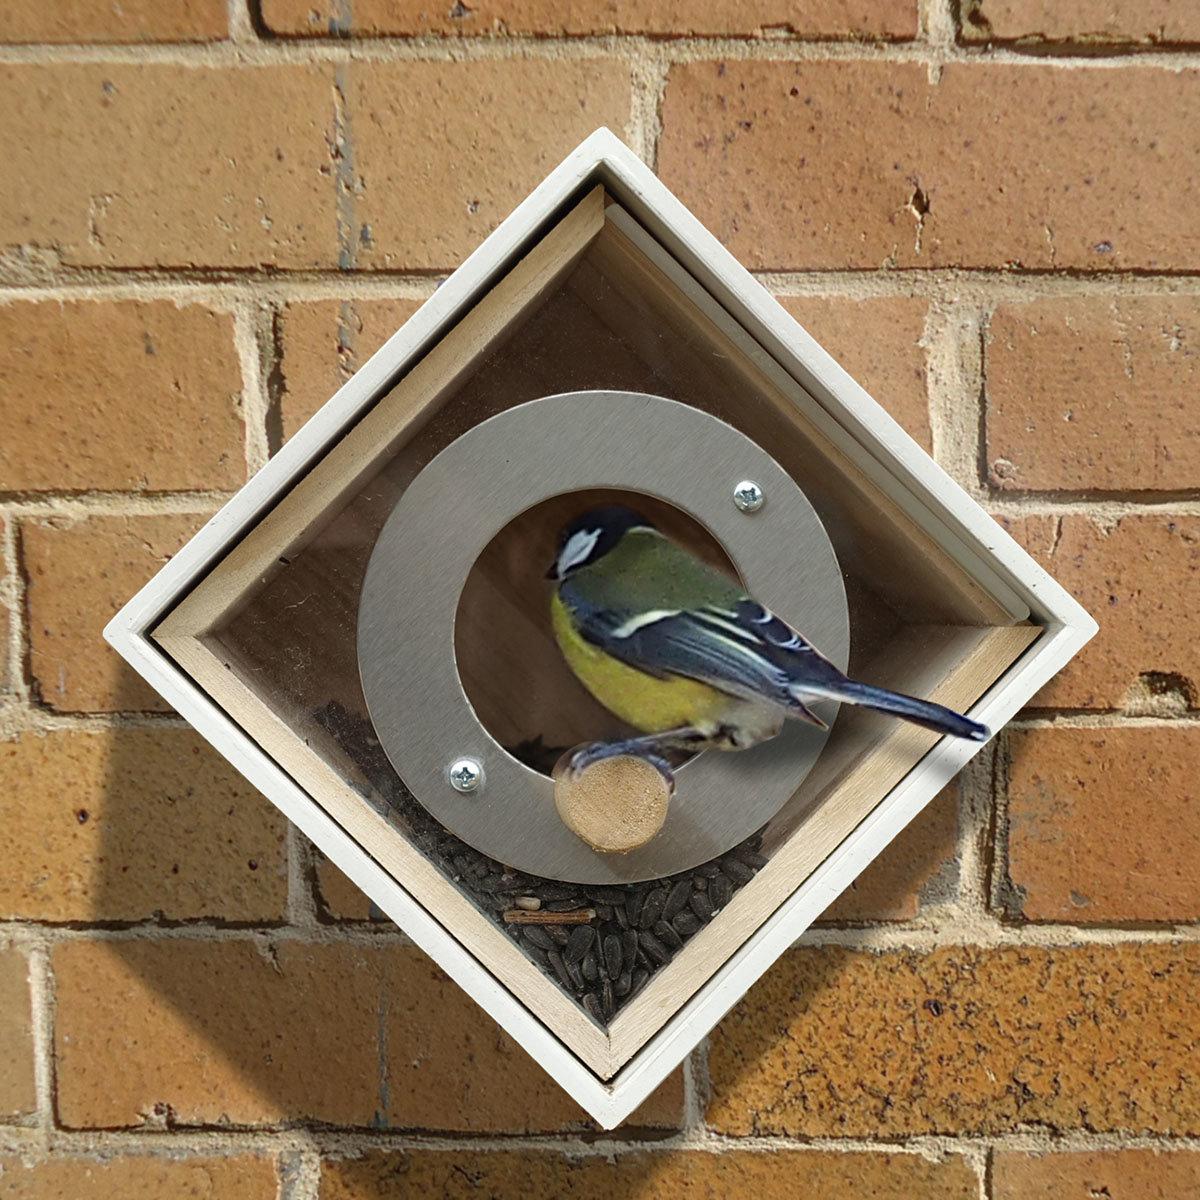 Vogelfutterhaus Urban Design | #2